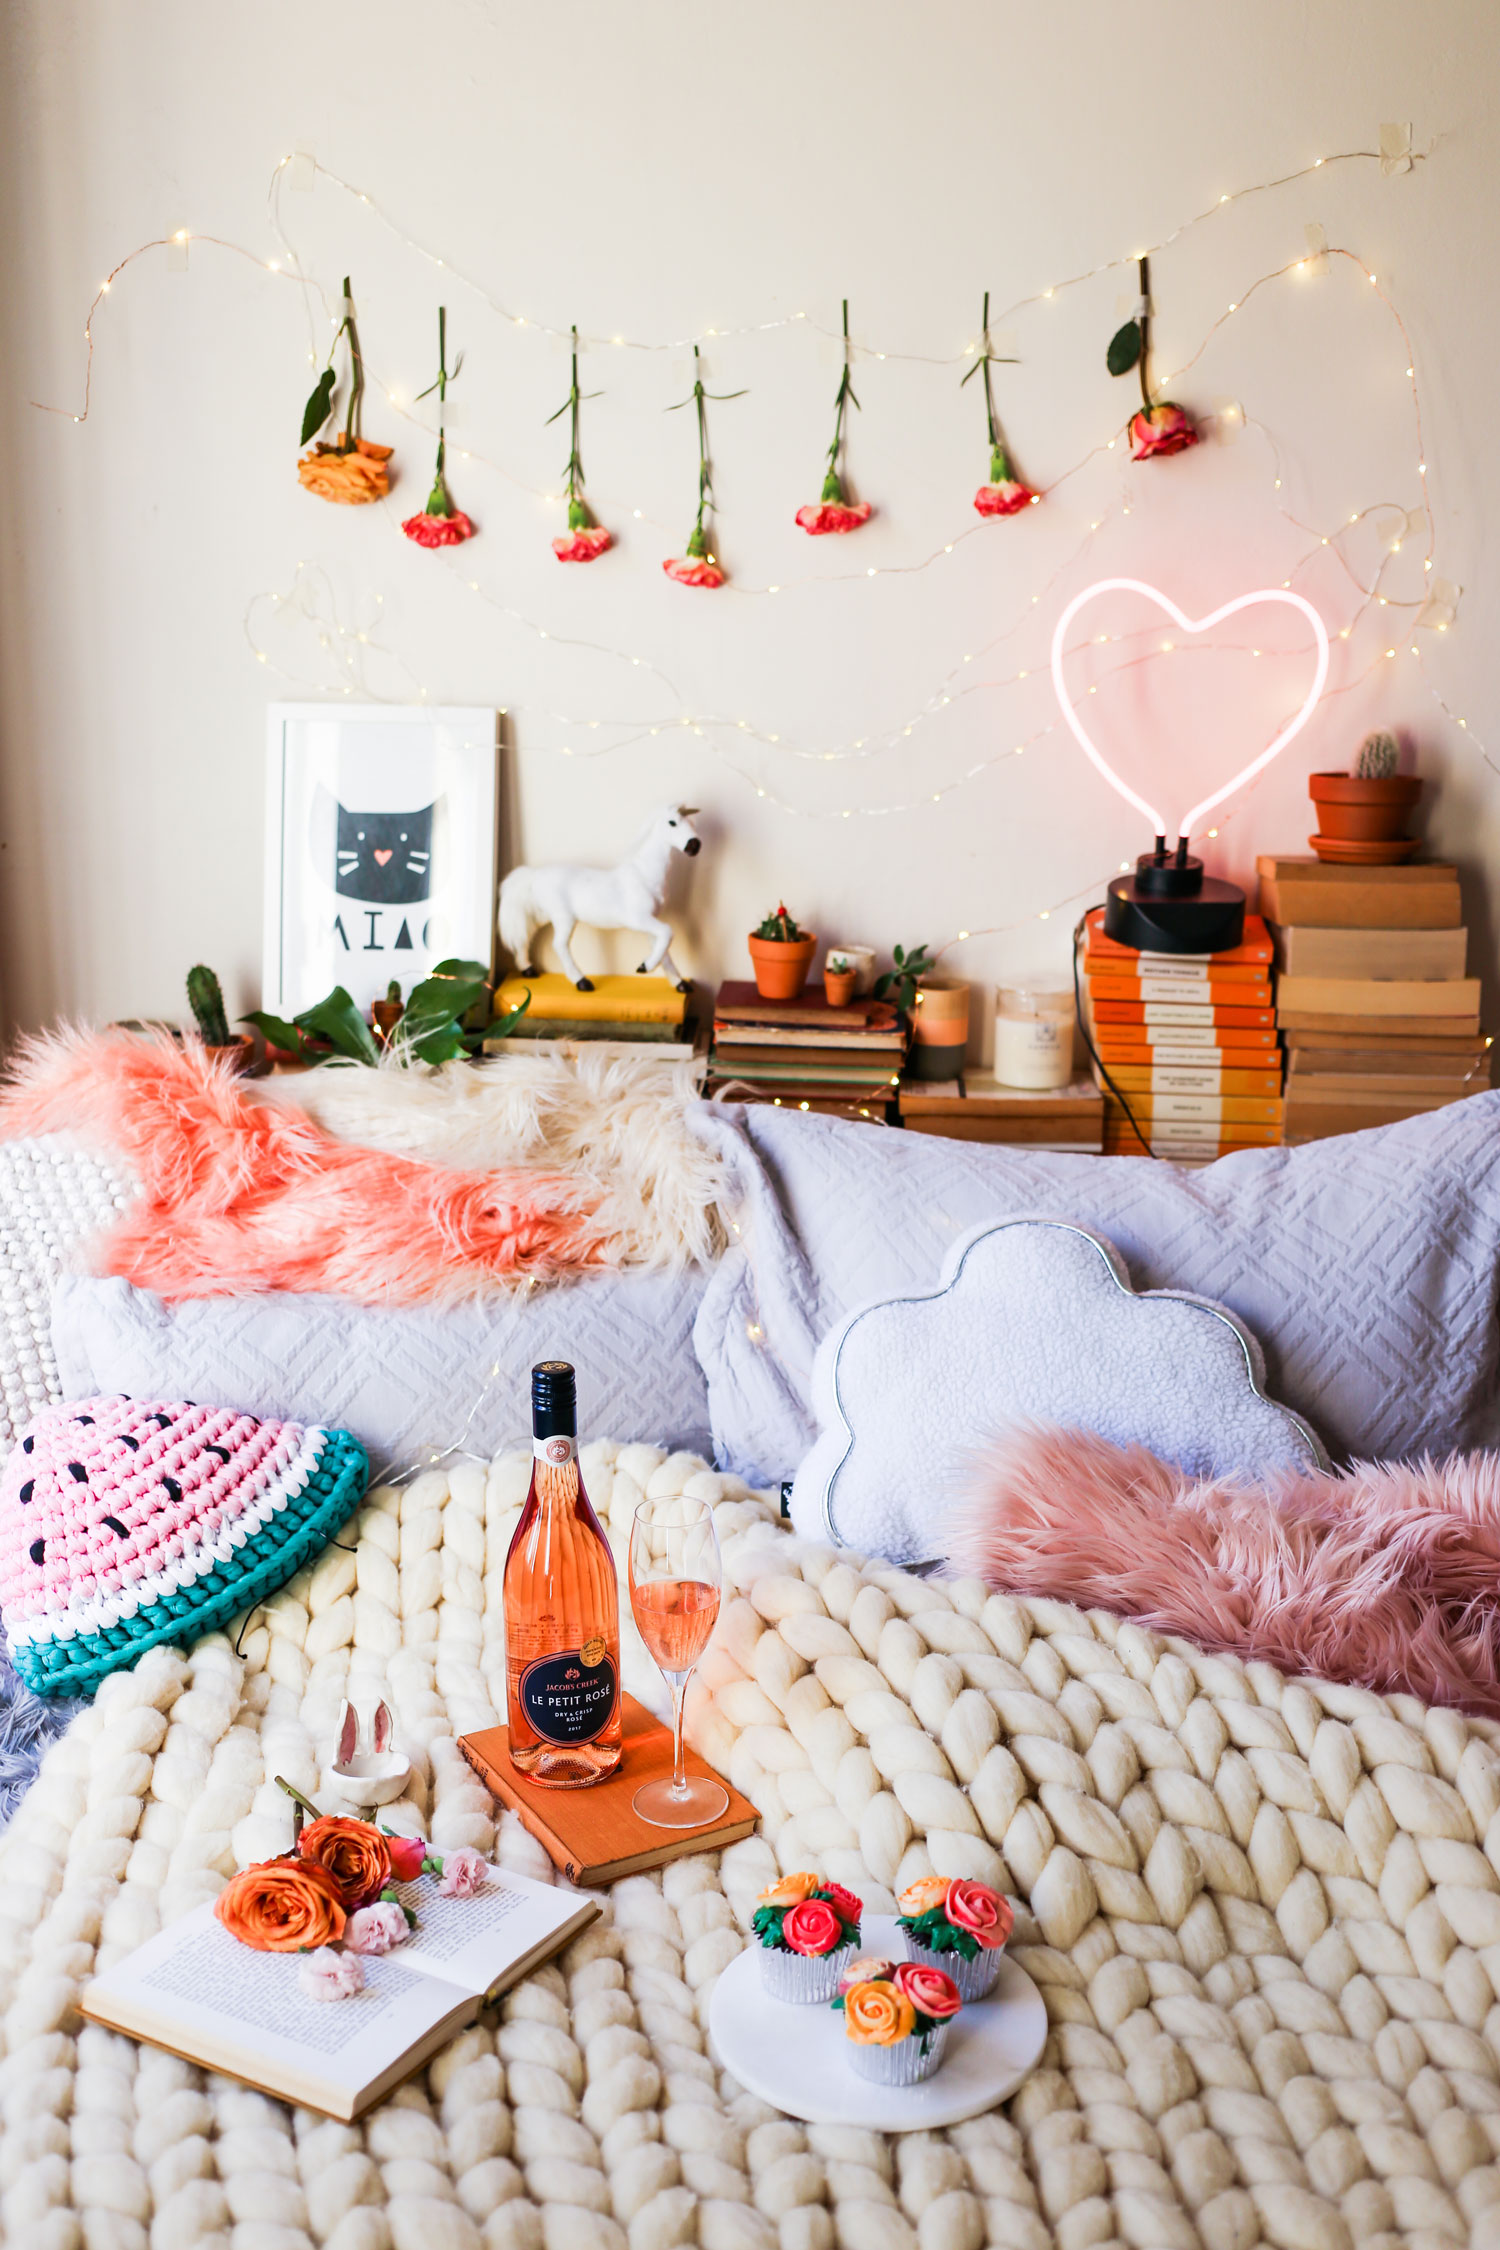 V-Day_Bedroom_La-Petite-Rose-x-HELLO-MISS-MAY.jpg